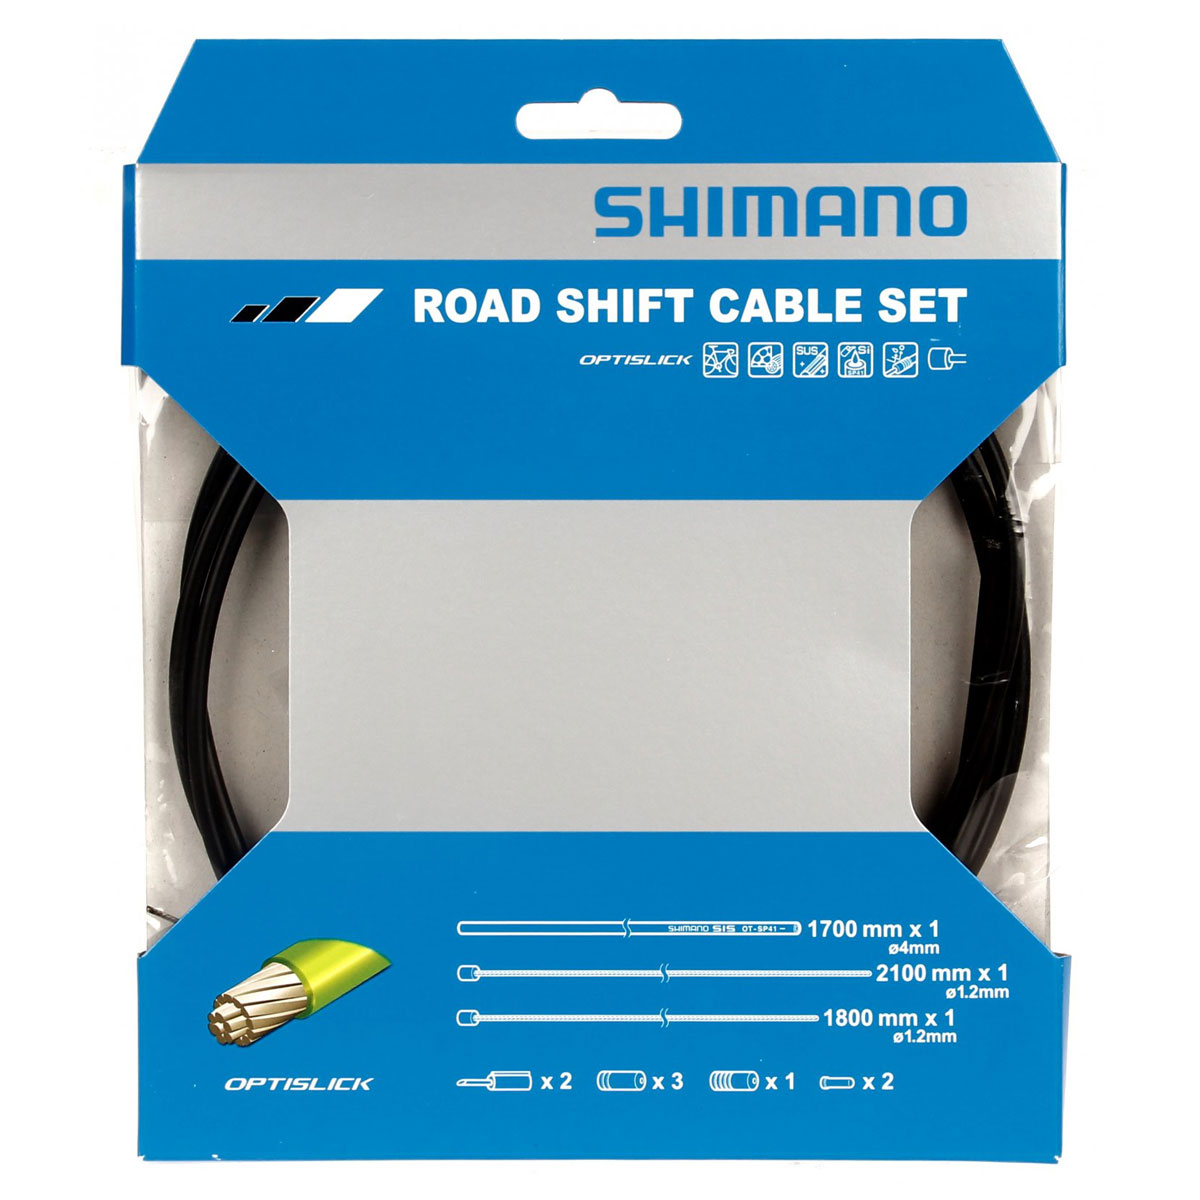 ENSEMBLE CABLE/GAINE VITESSE SHIMANO ROUTE OPTISLIK NOIR